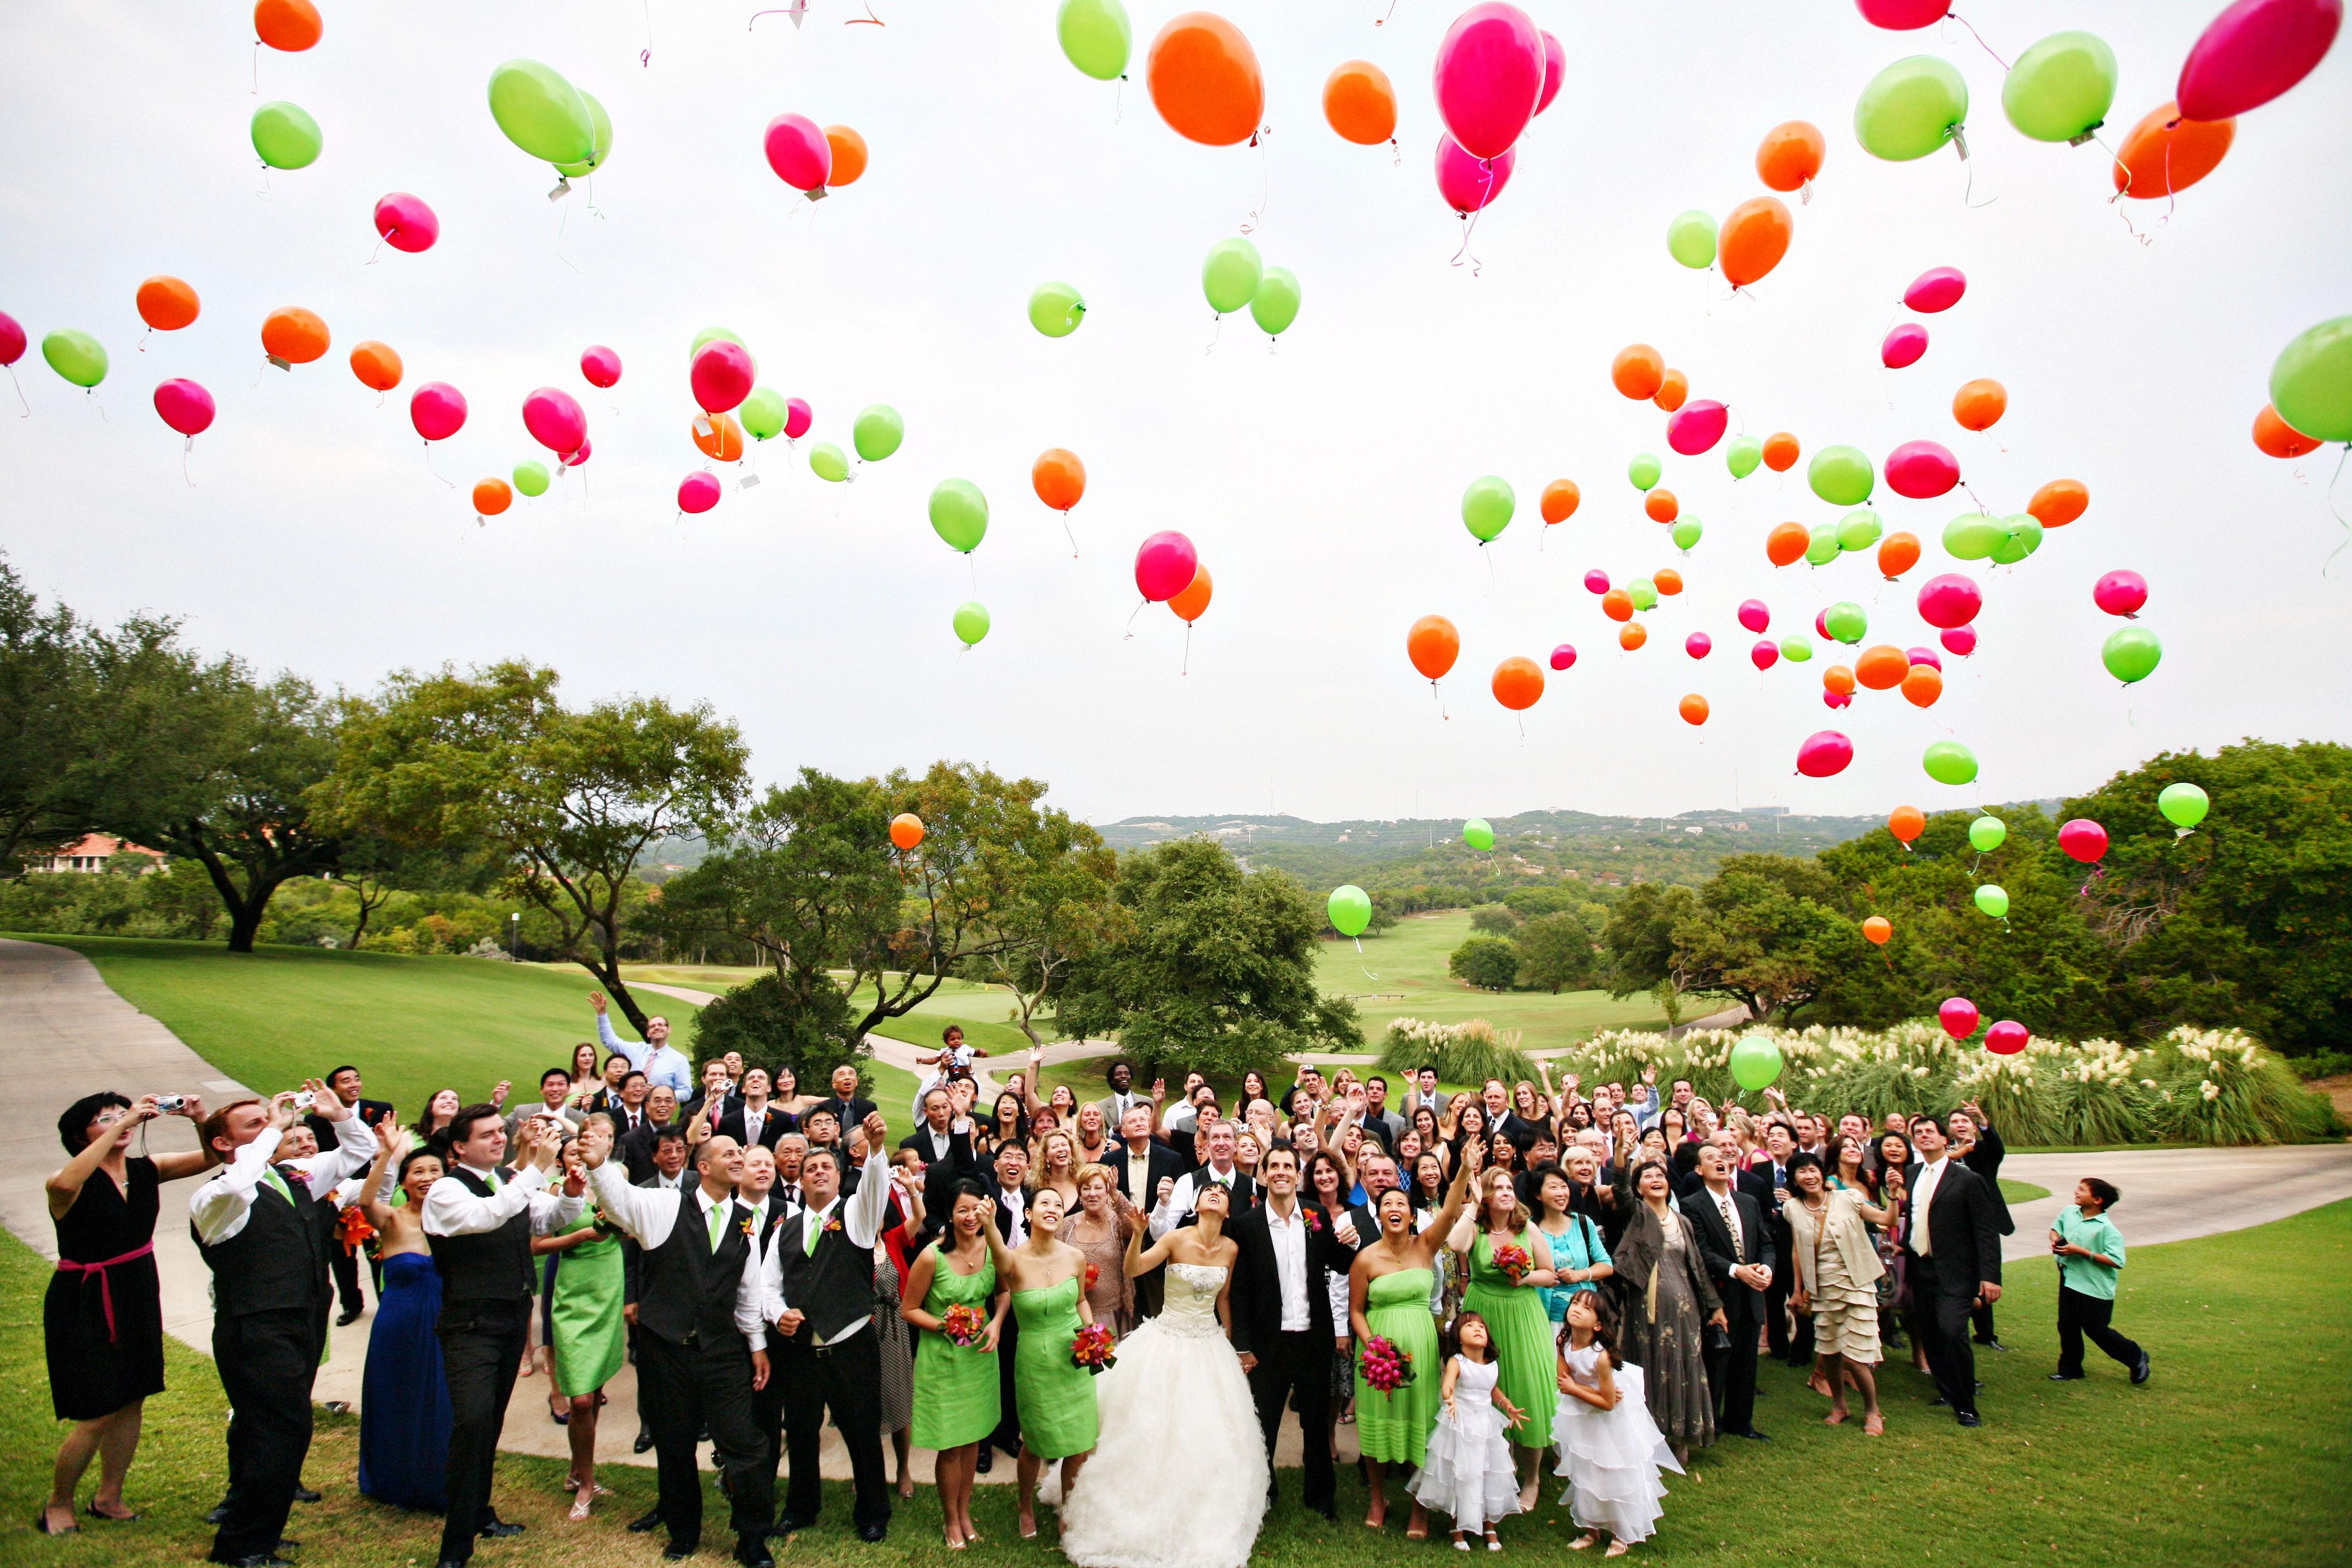 Wedding-balloon-release